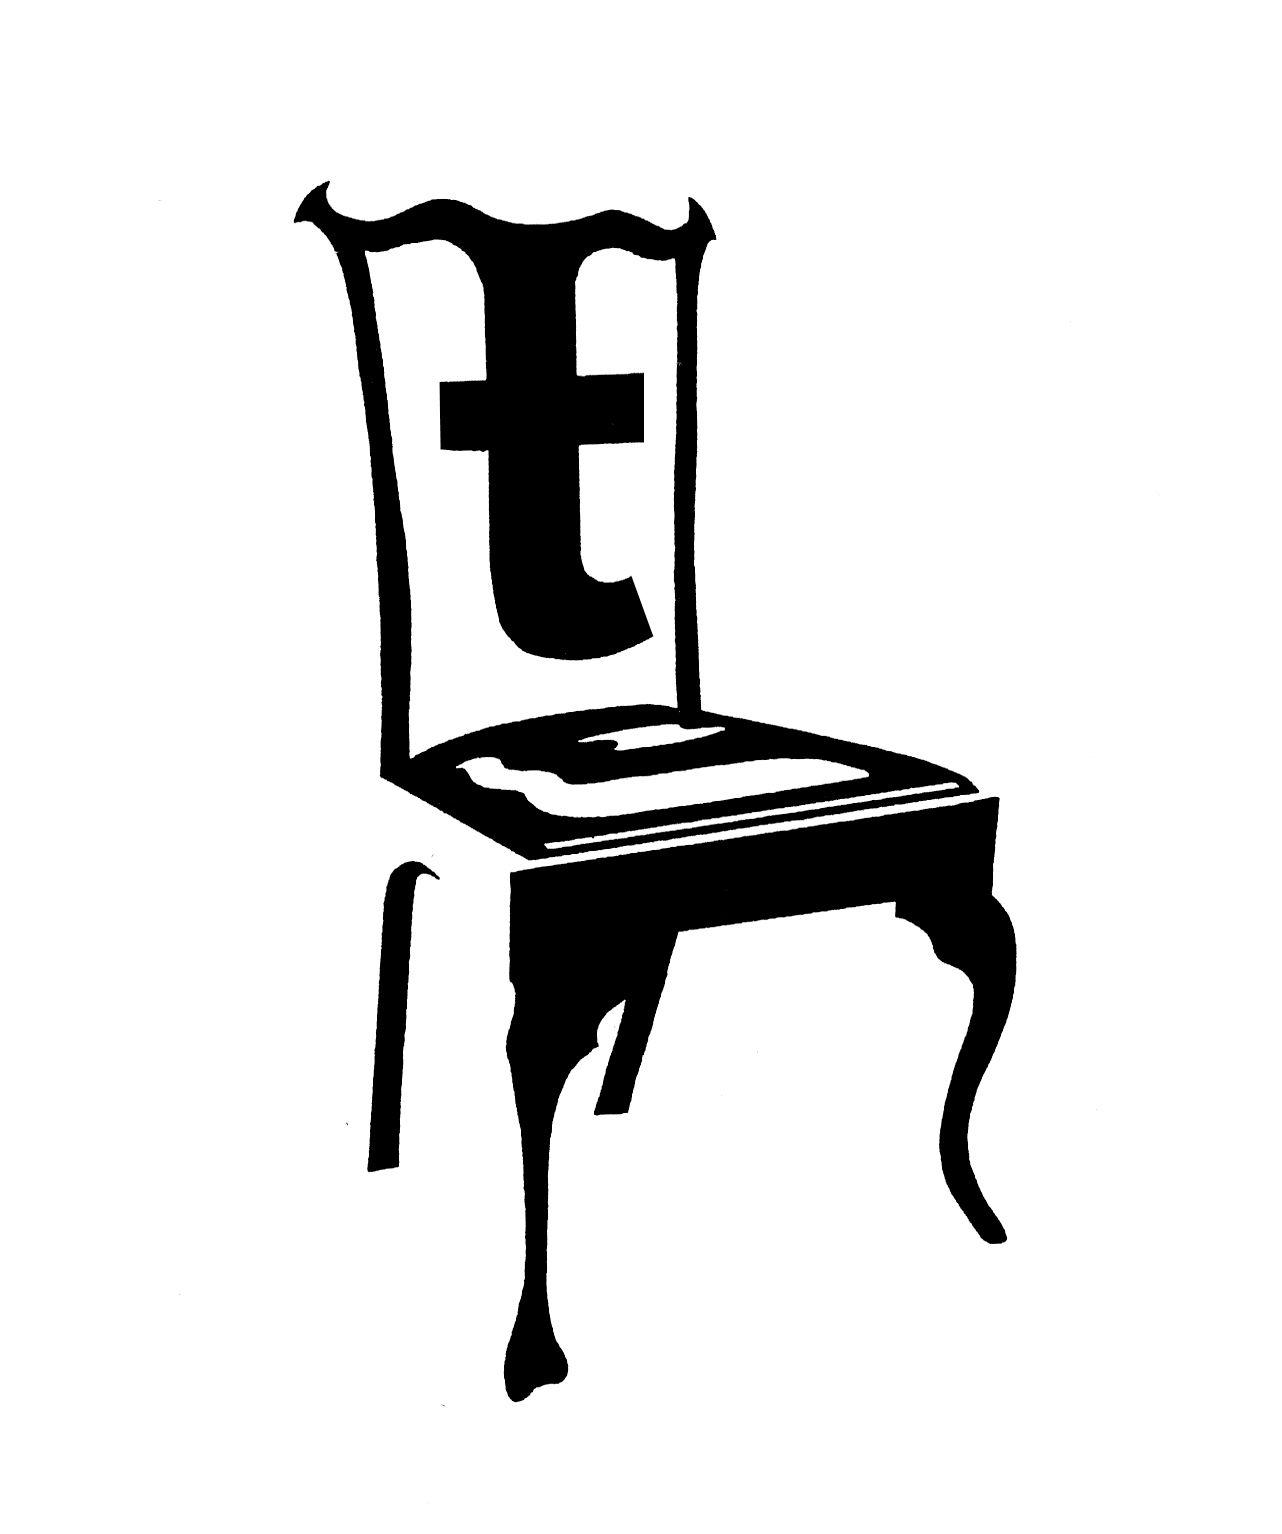 Chair logo Logos Pinterest